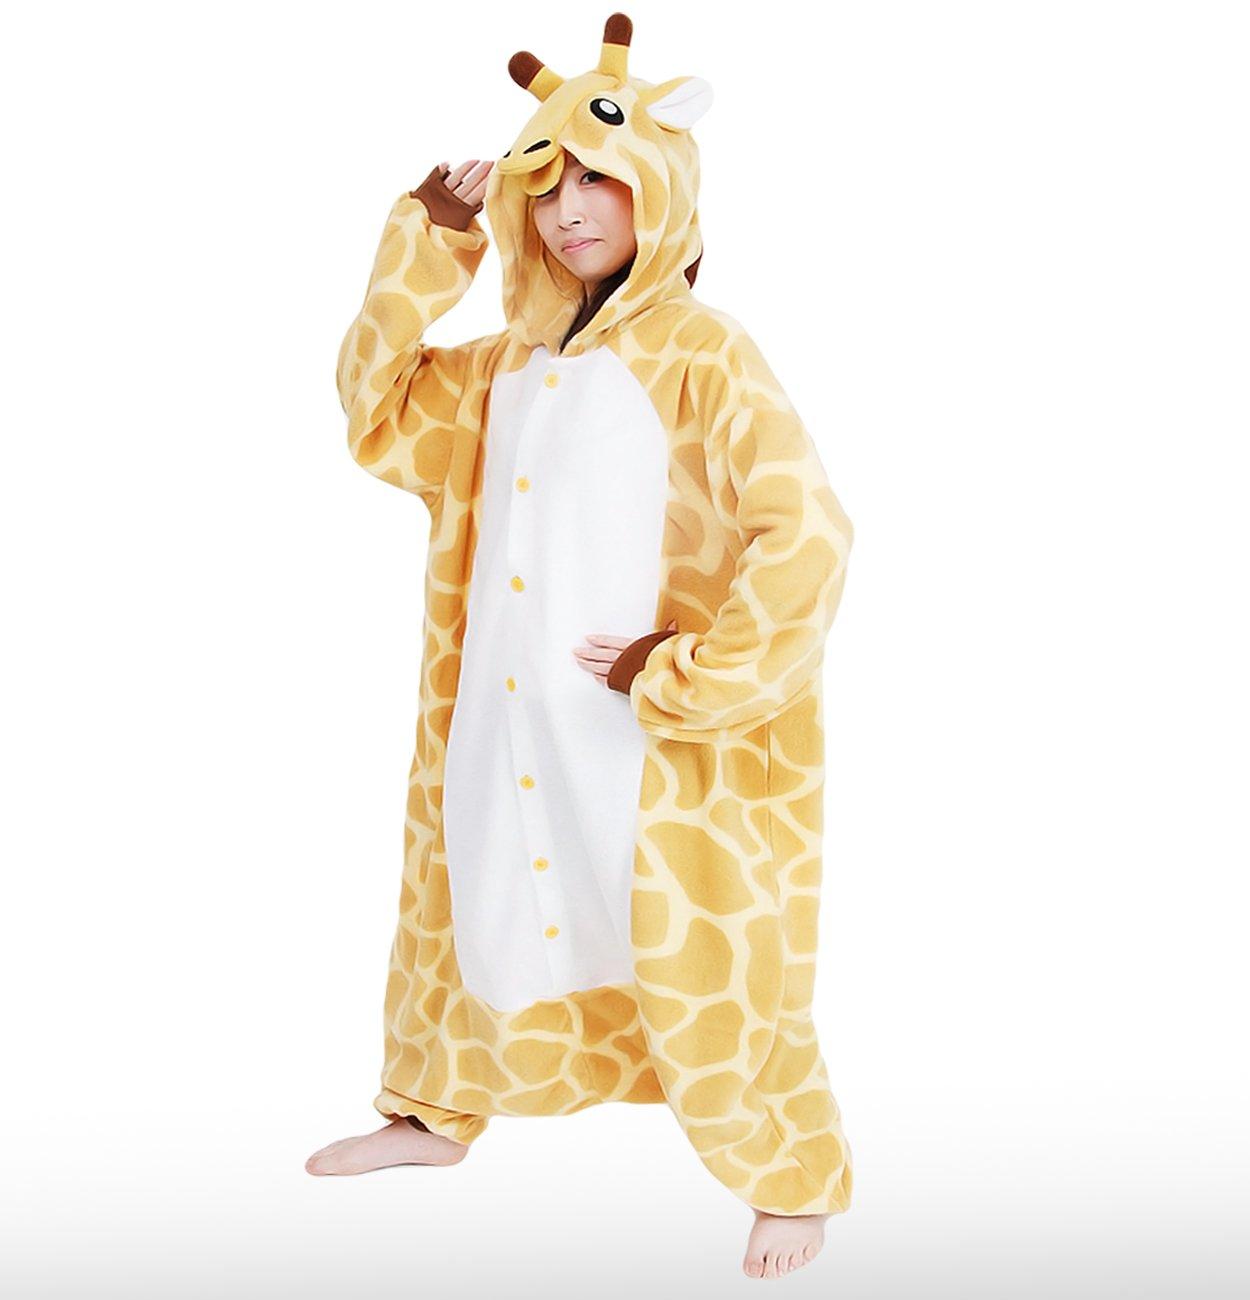 Giraffe Kigurumi Kigurumi Kigurumi 2644 characters (japan import) 3b9aab